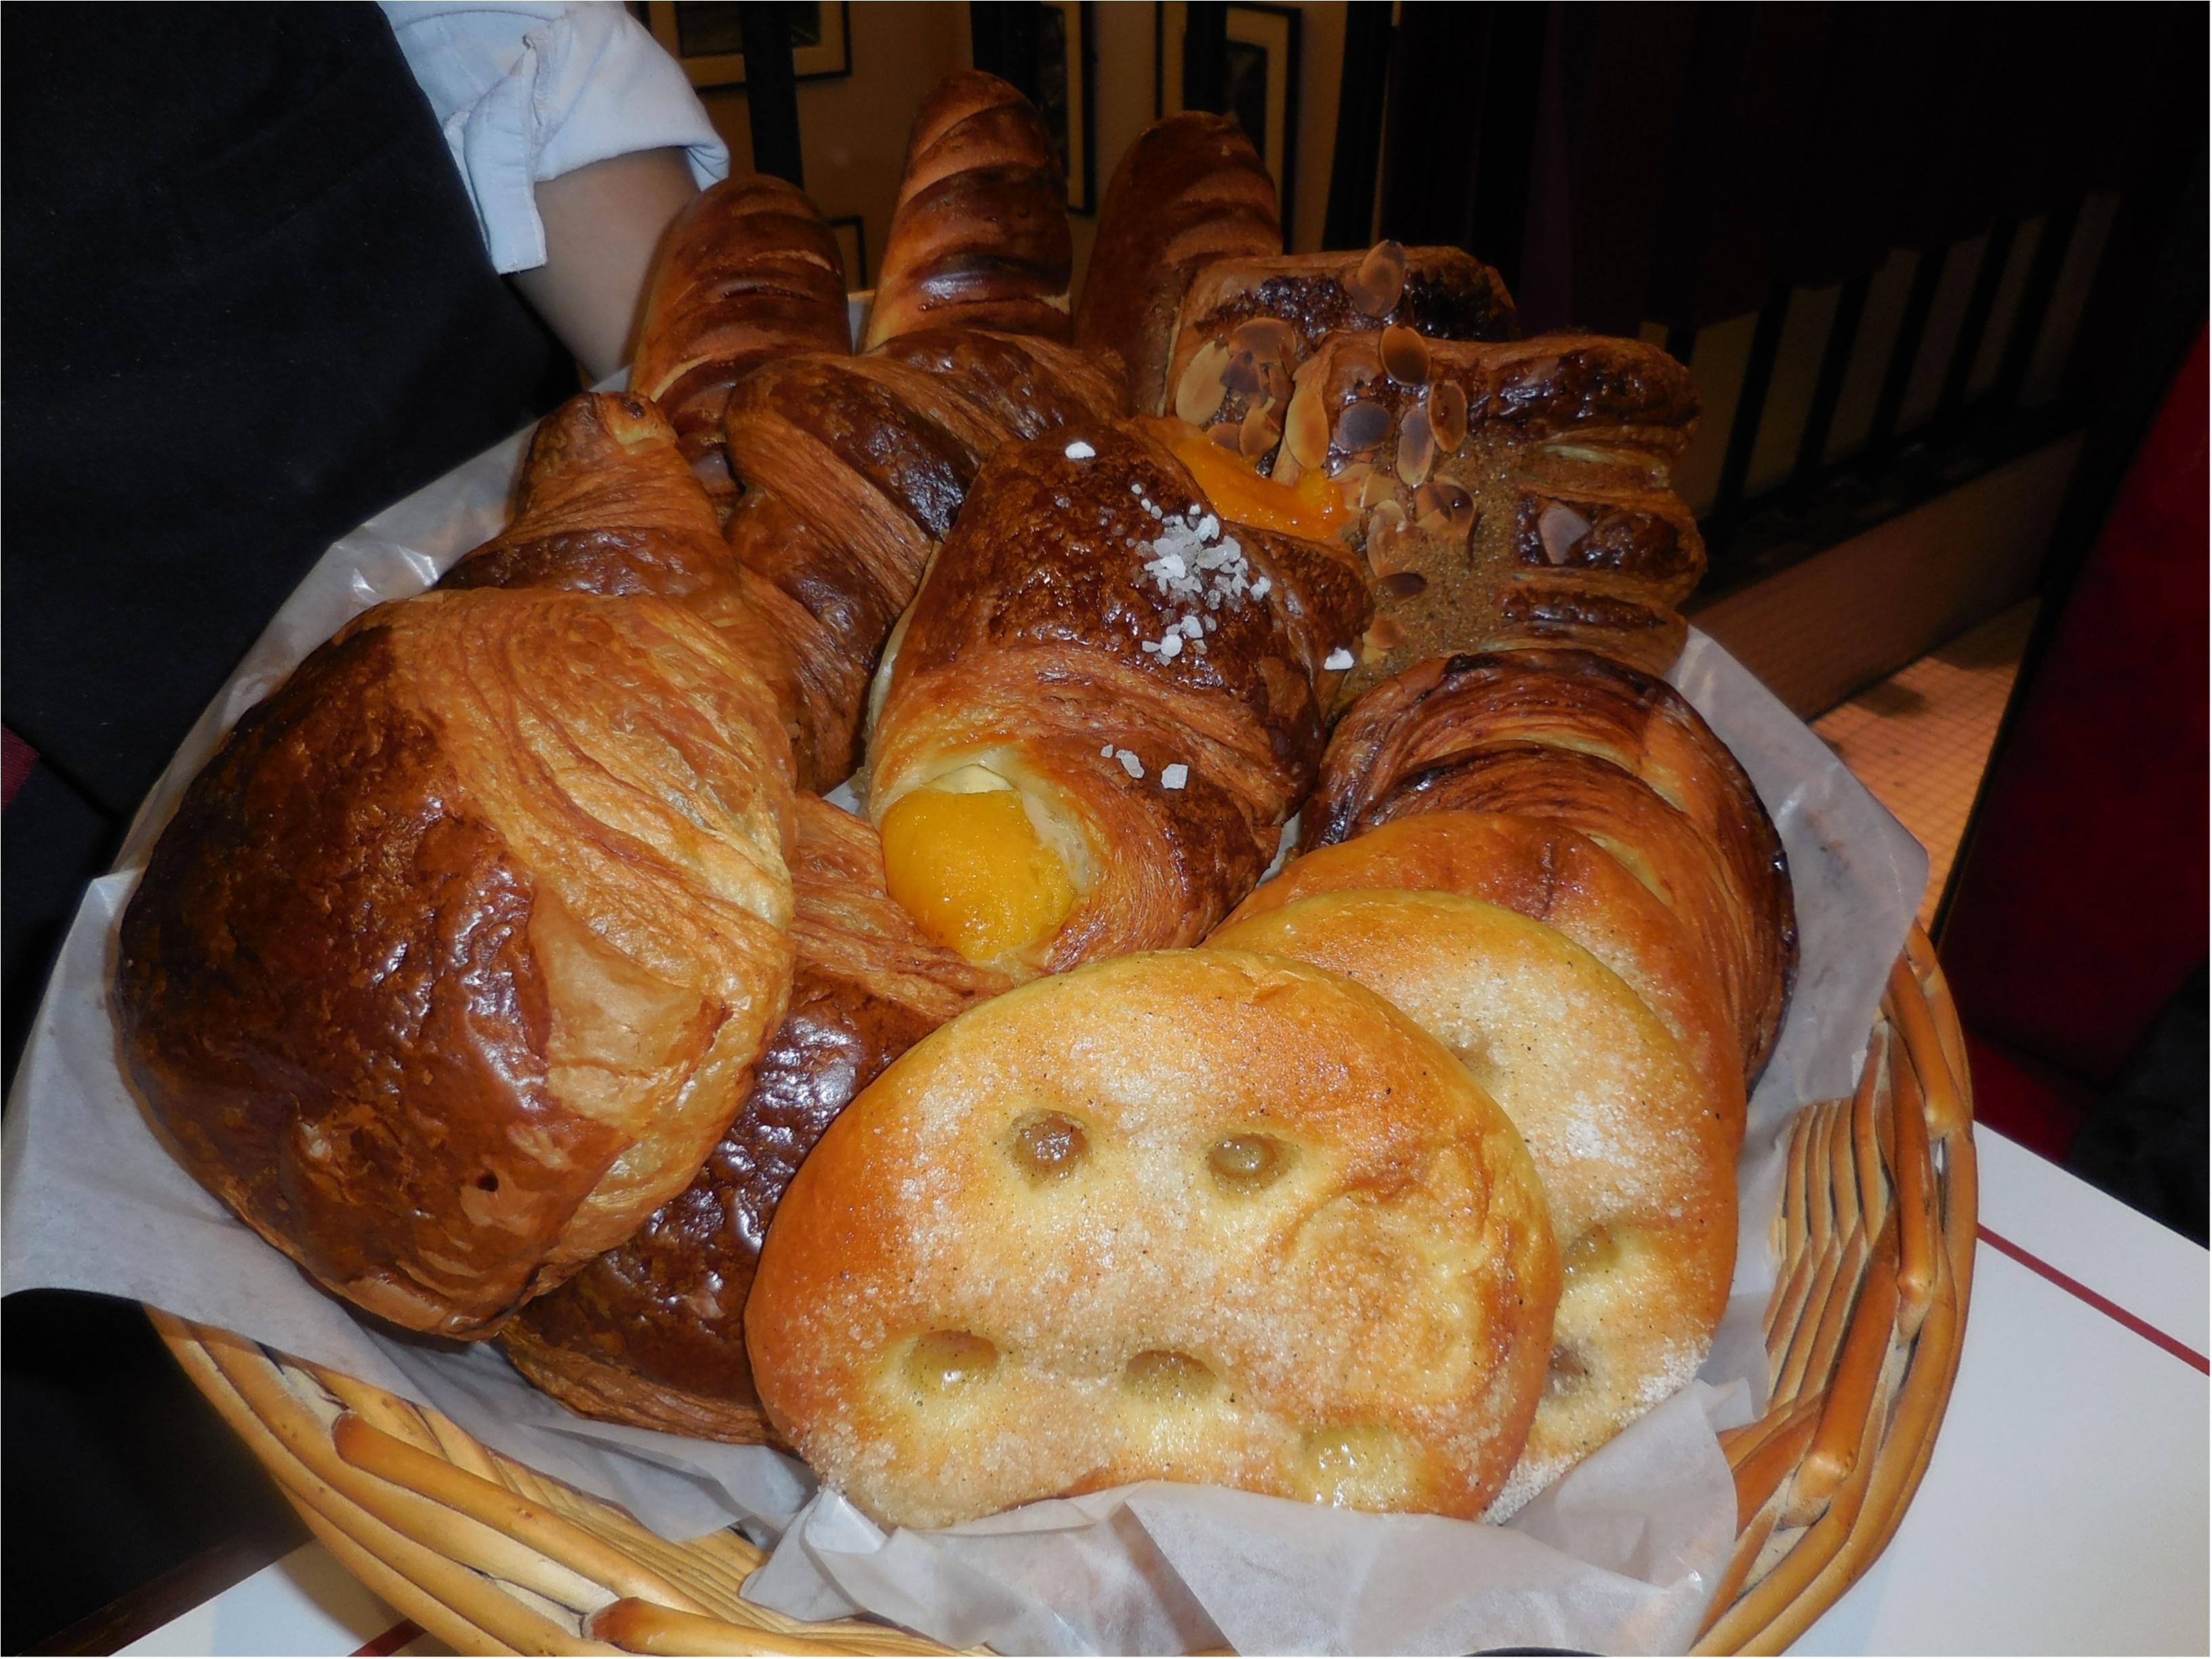 VIRON ブーランジェリー パン モーニング